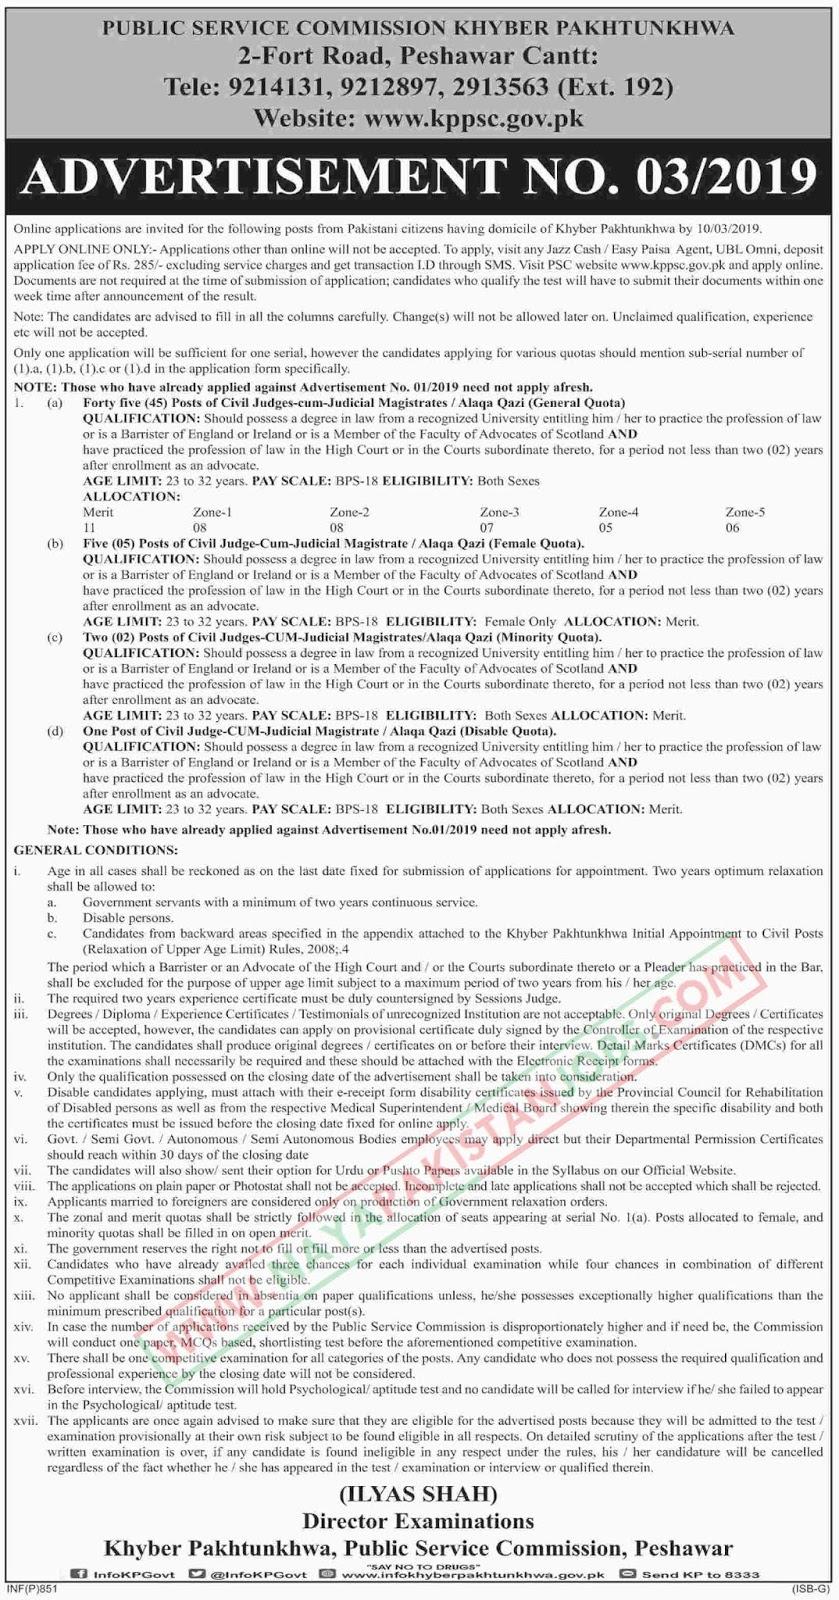 KPPSC Jobs, KPPSC Civil Judge Jobs 2019, KPPSC Civil Judge Jobs 2019 February